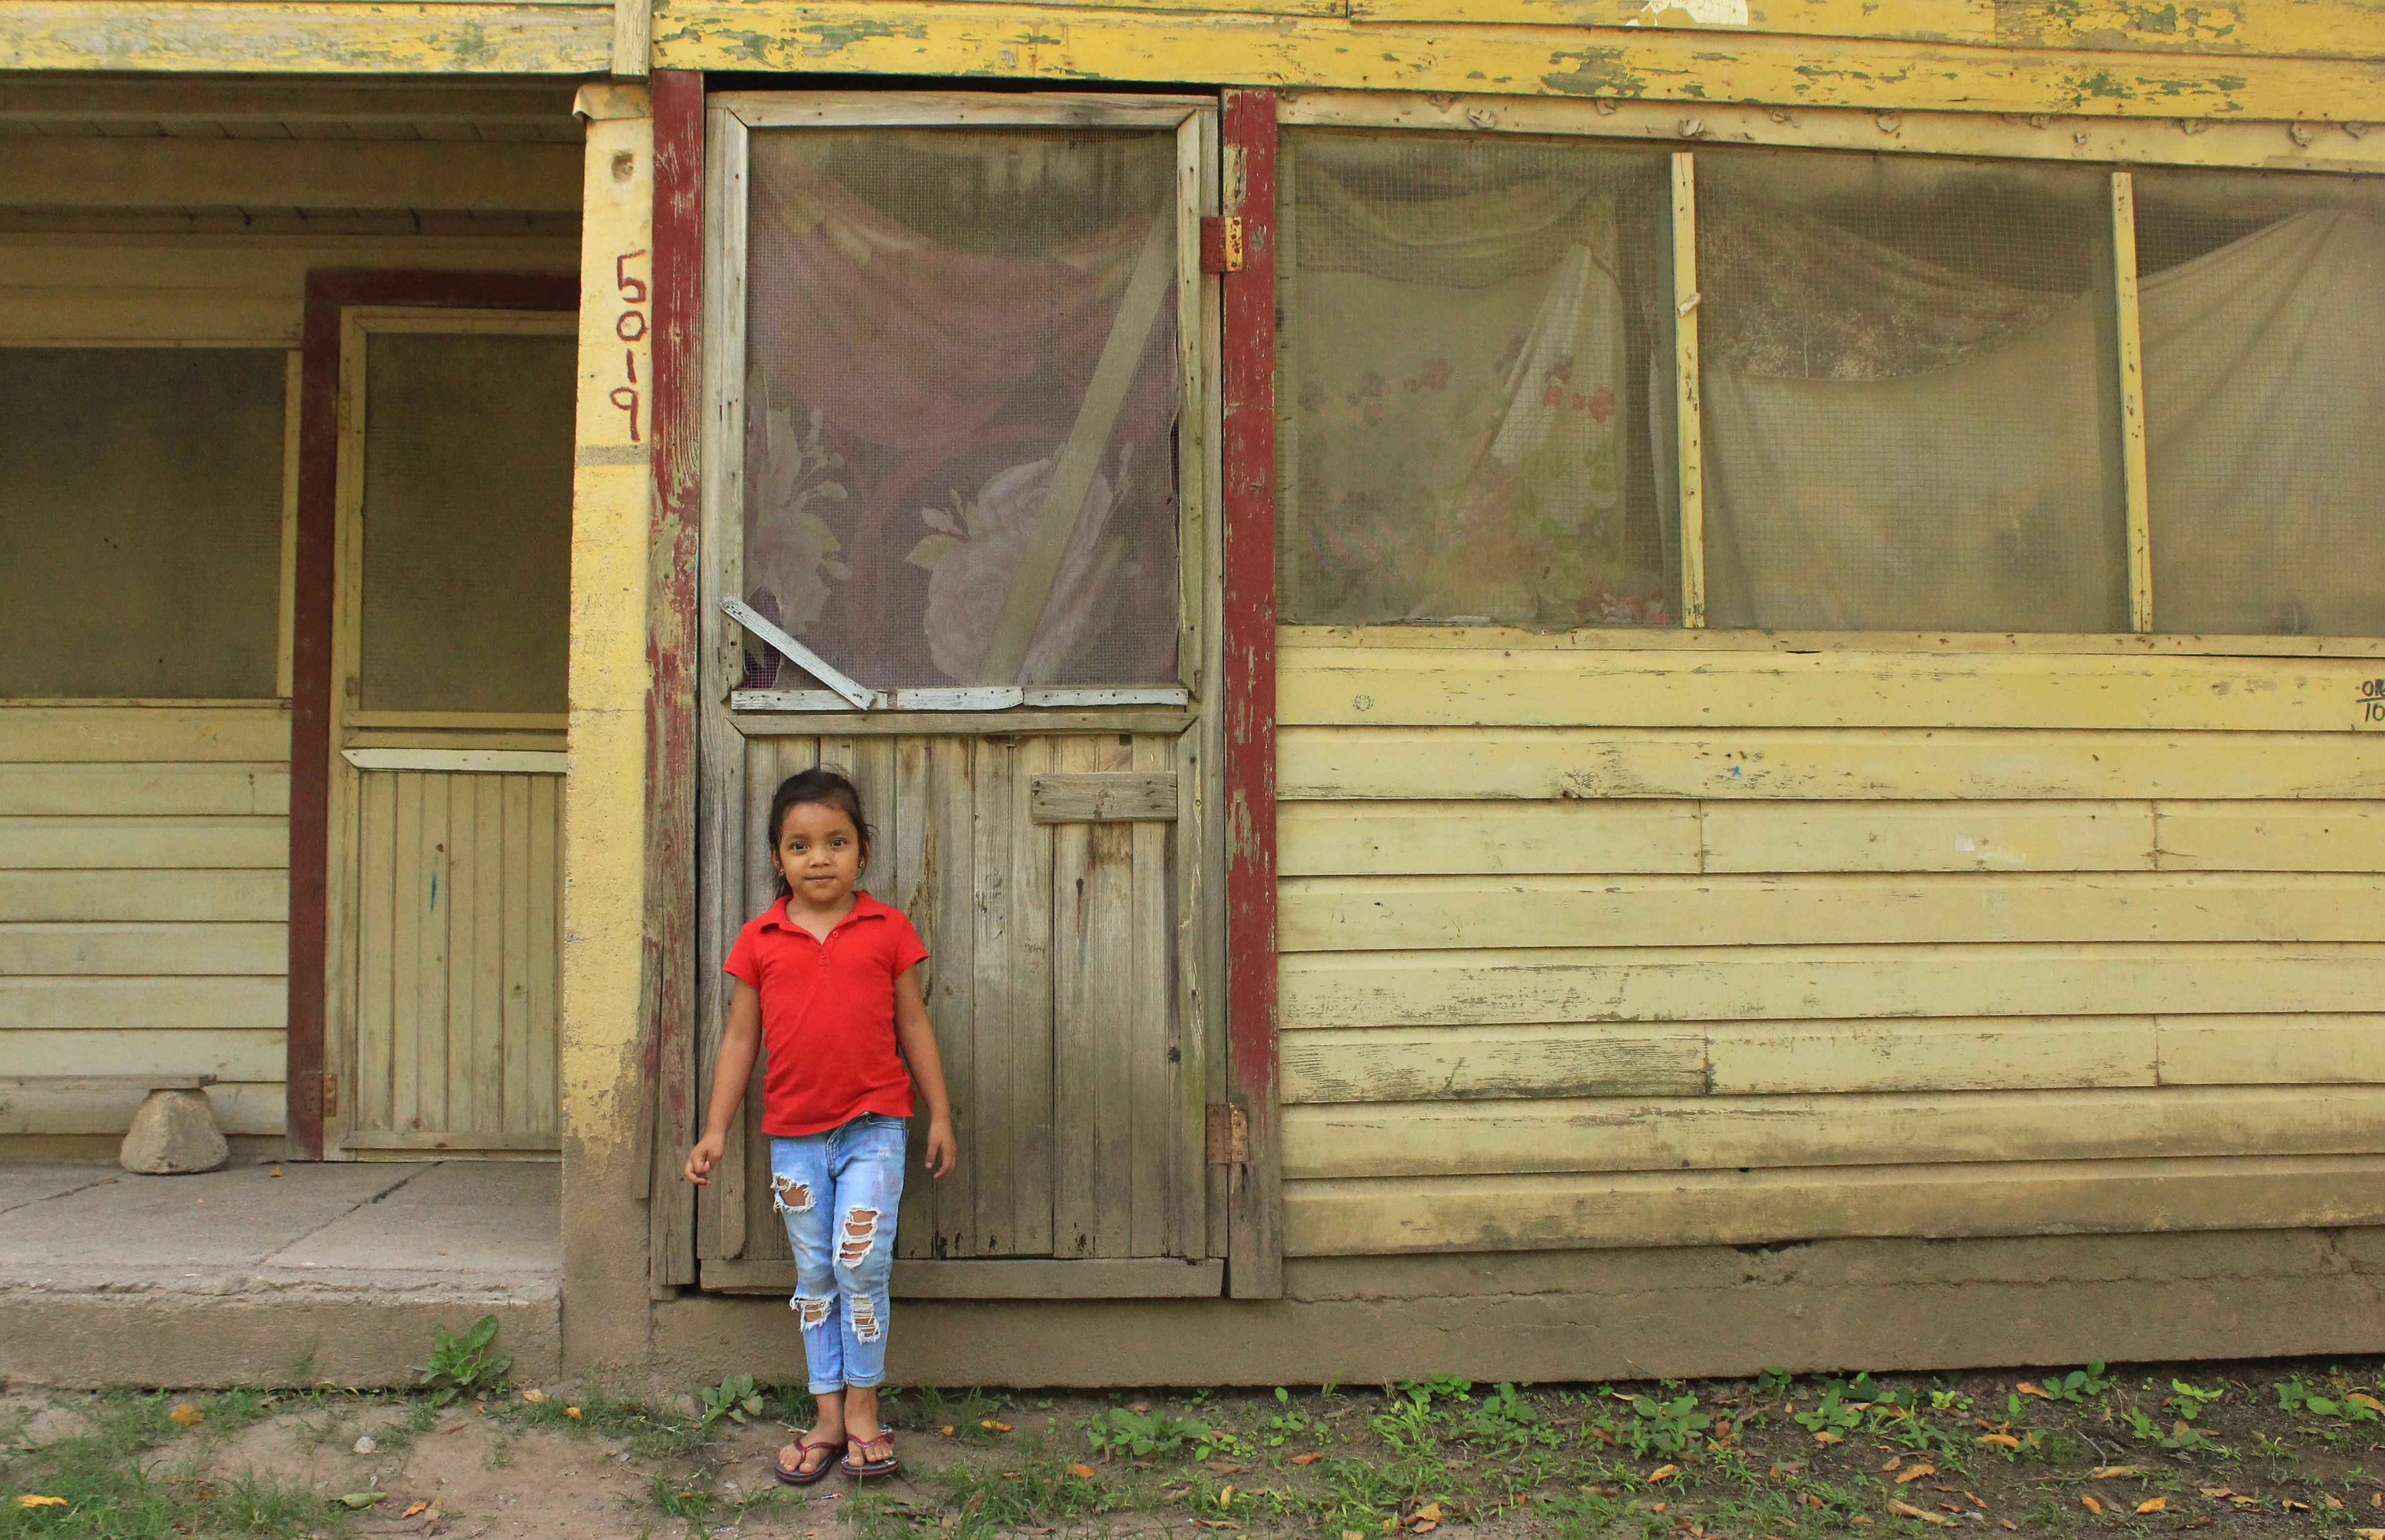 Some farmers and their families, like six-year-old Camila Sofía Martínez Bonilla, are still living in the barracks that line the northern coast of Honduras. (María José Burgos/CBC)